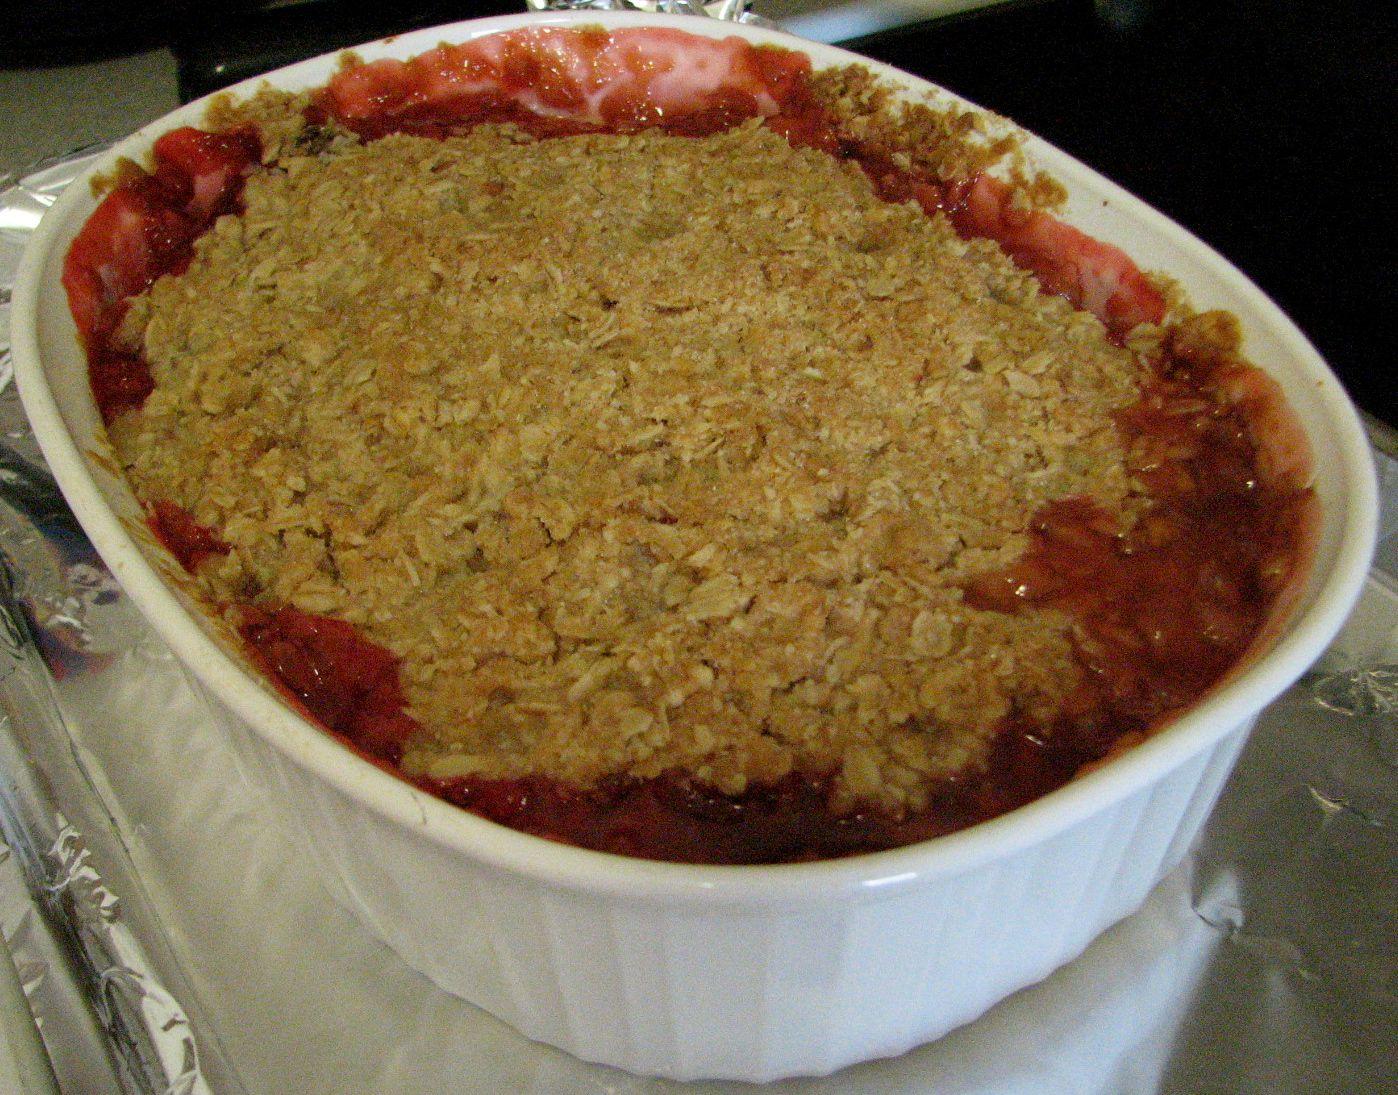 Shel S Kitchen Strawberry Rhubarb Crisp